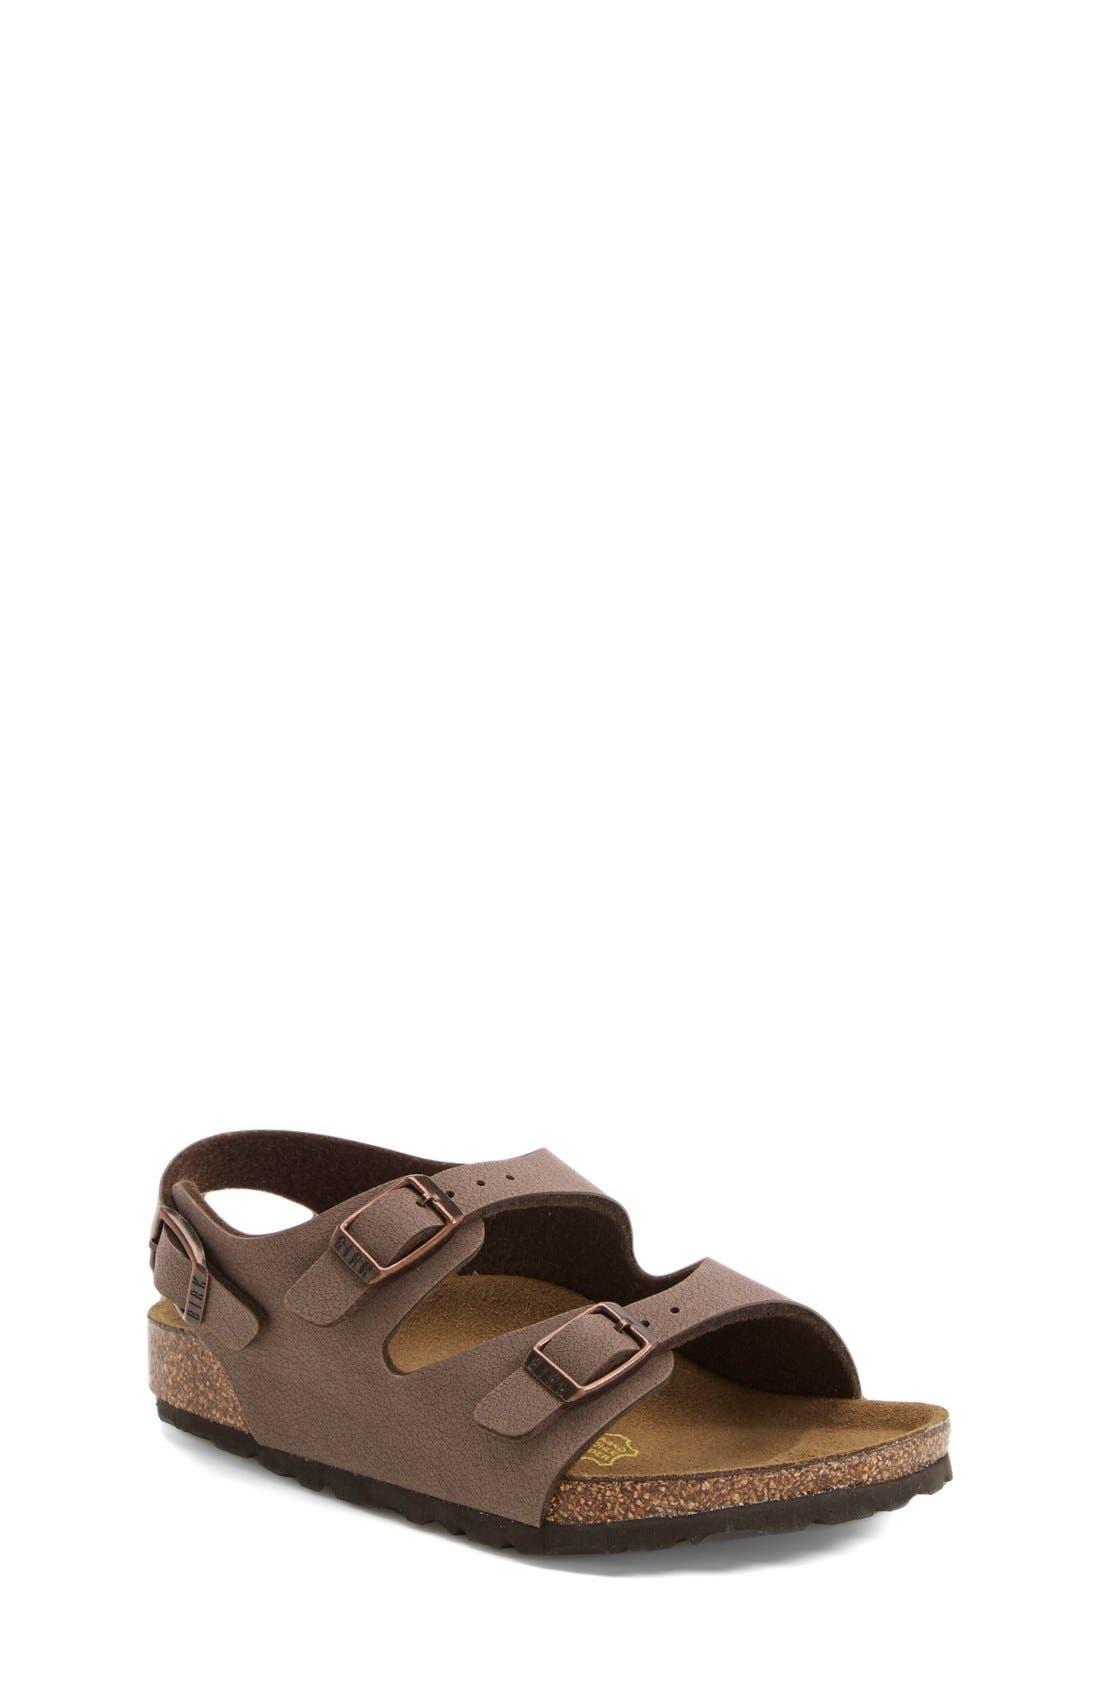 'Roma' Sandal,                         Main,                         color, Mocha